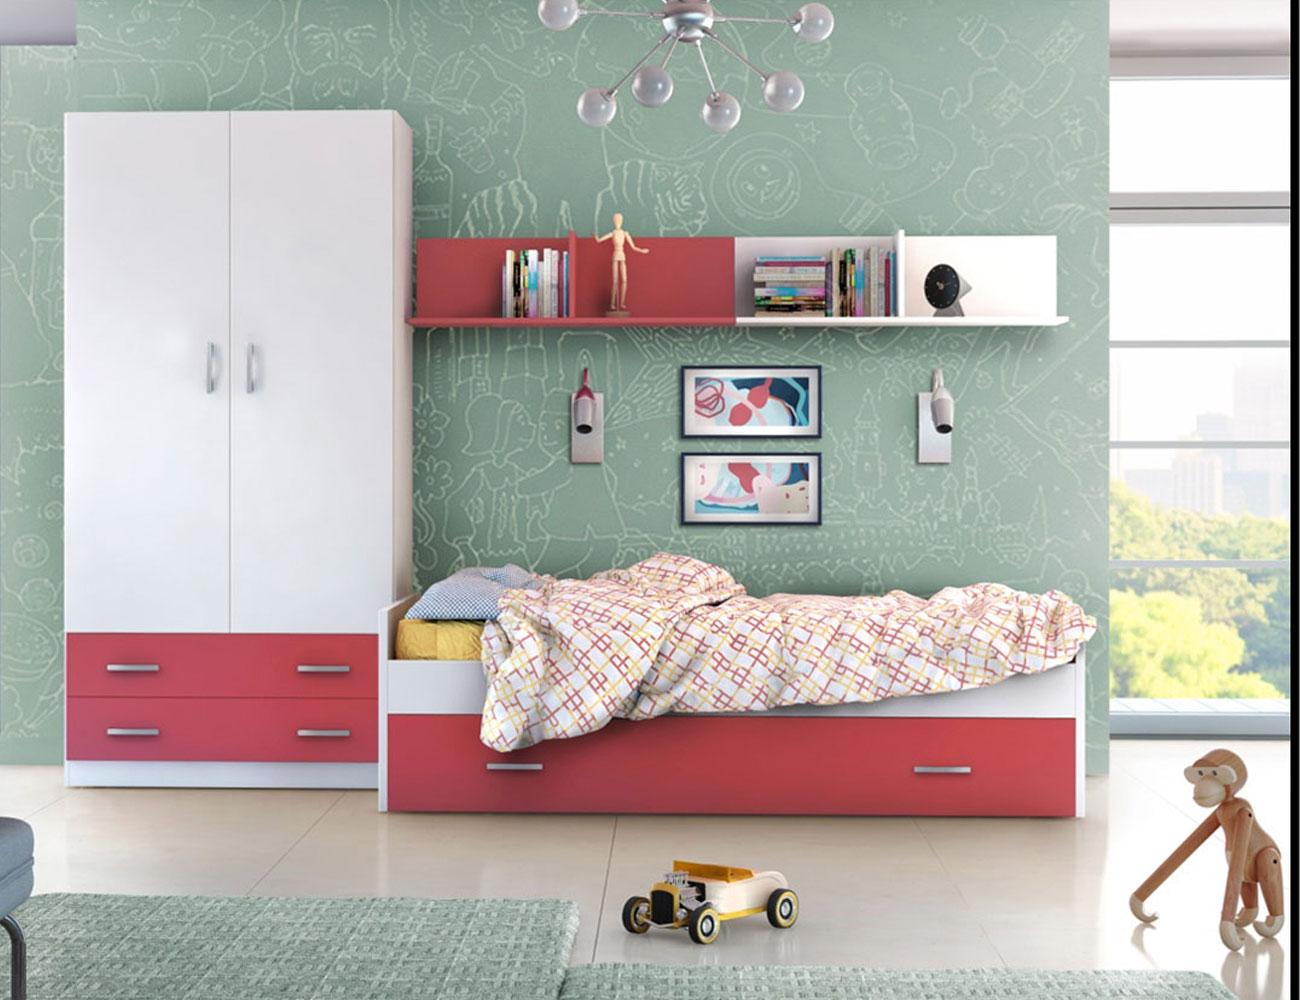 04 dormitorio juvenil cama nido arrastre